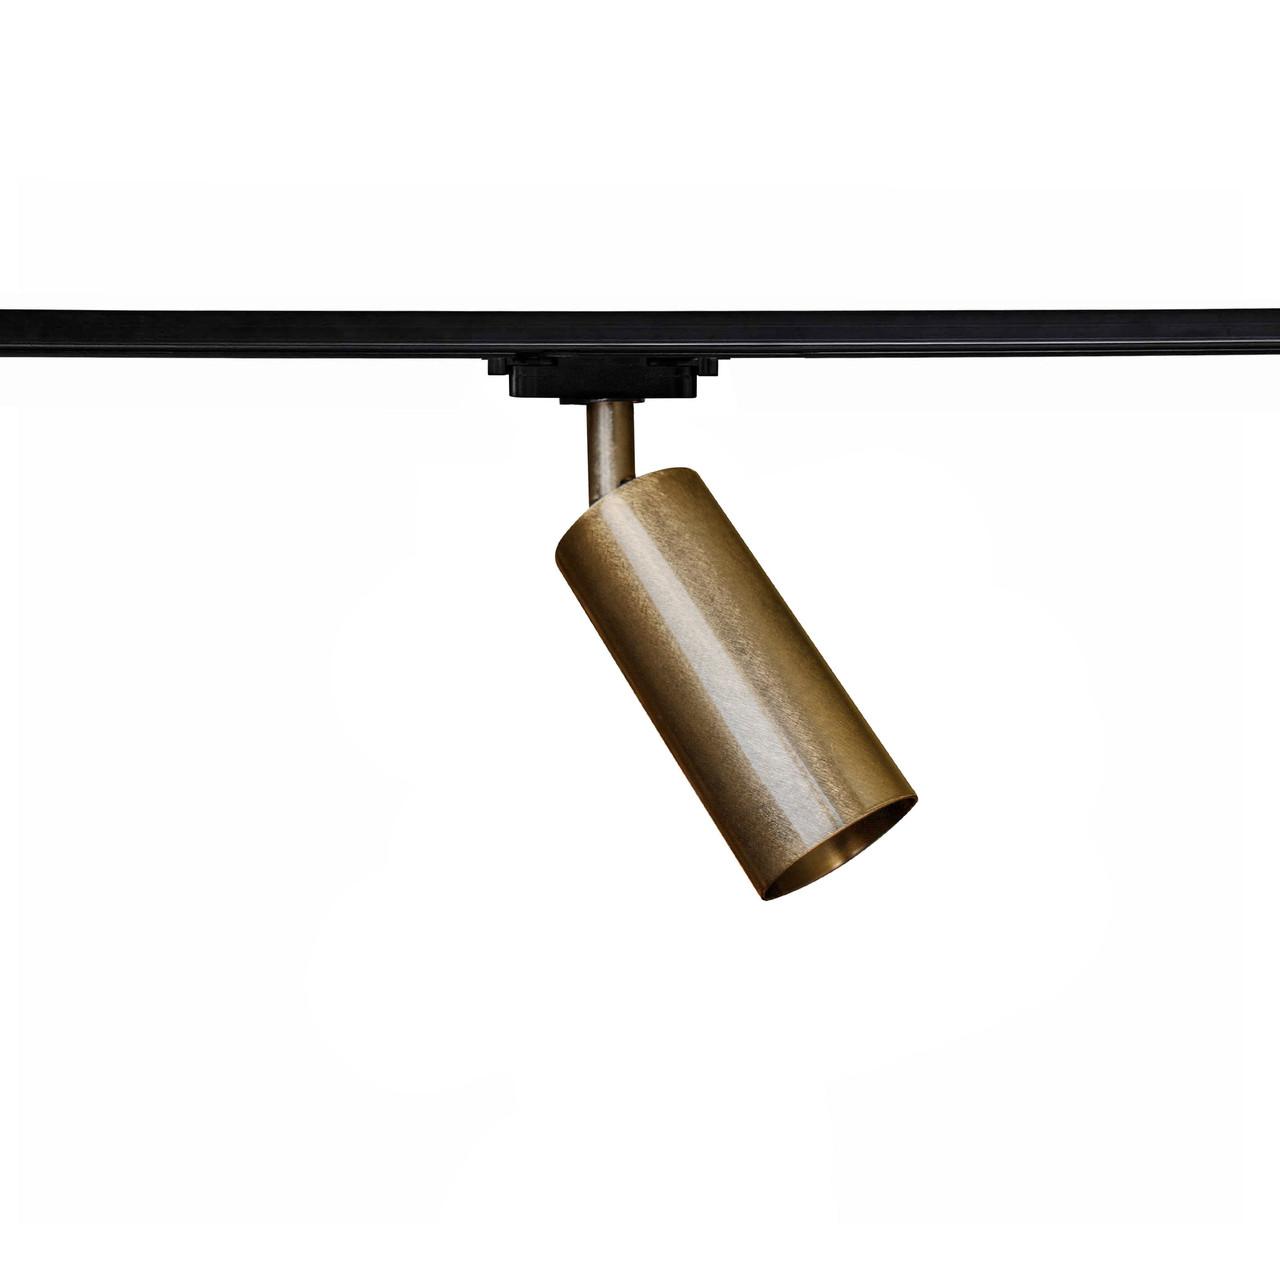 Светильник трековый под лампу Е27 MSK Electric NT 1105-1 BN бронза